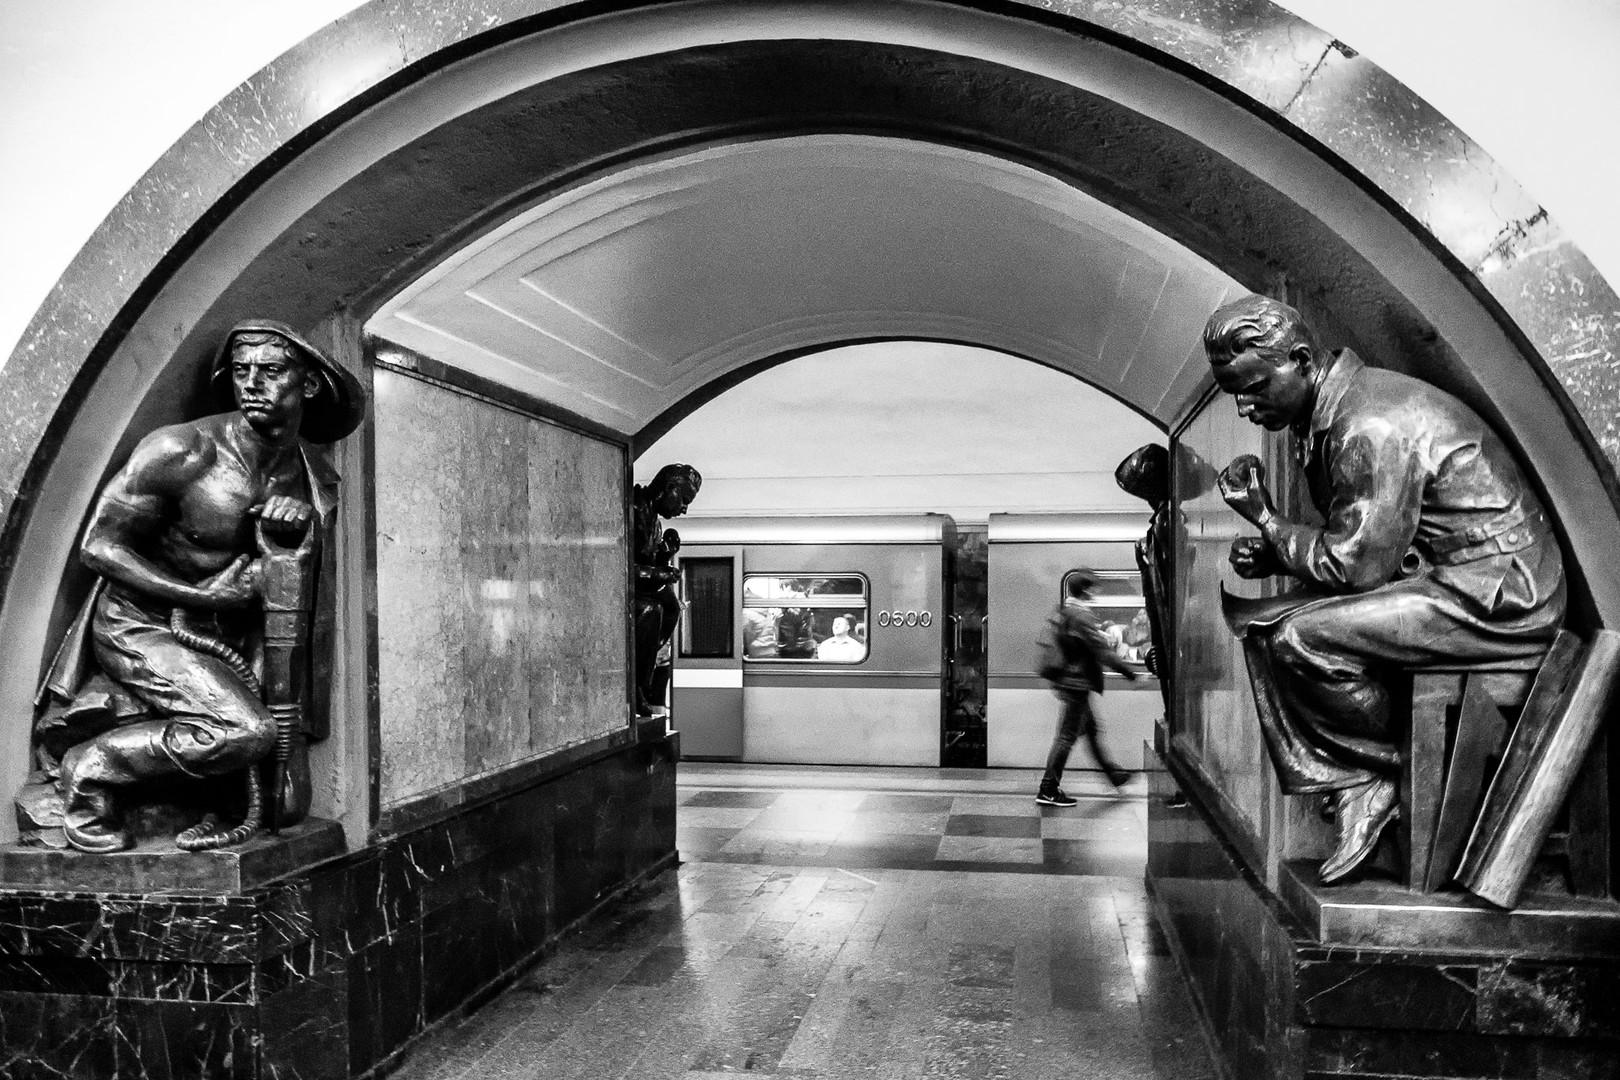 Gardiens du métro / Underground guards